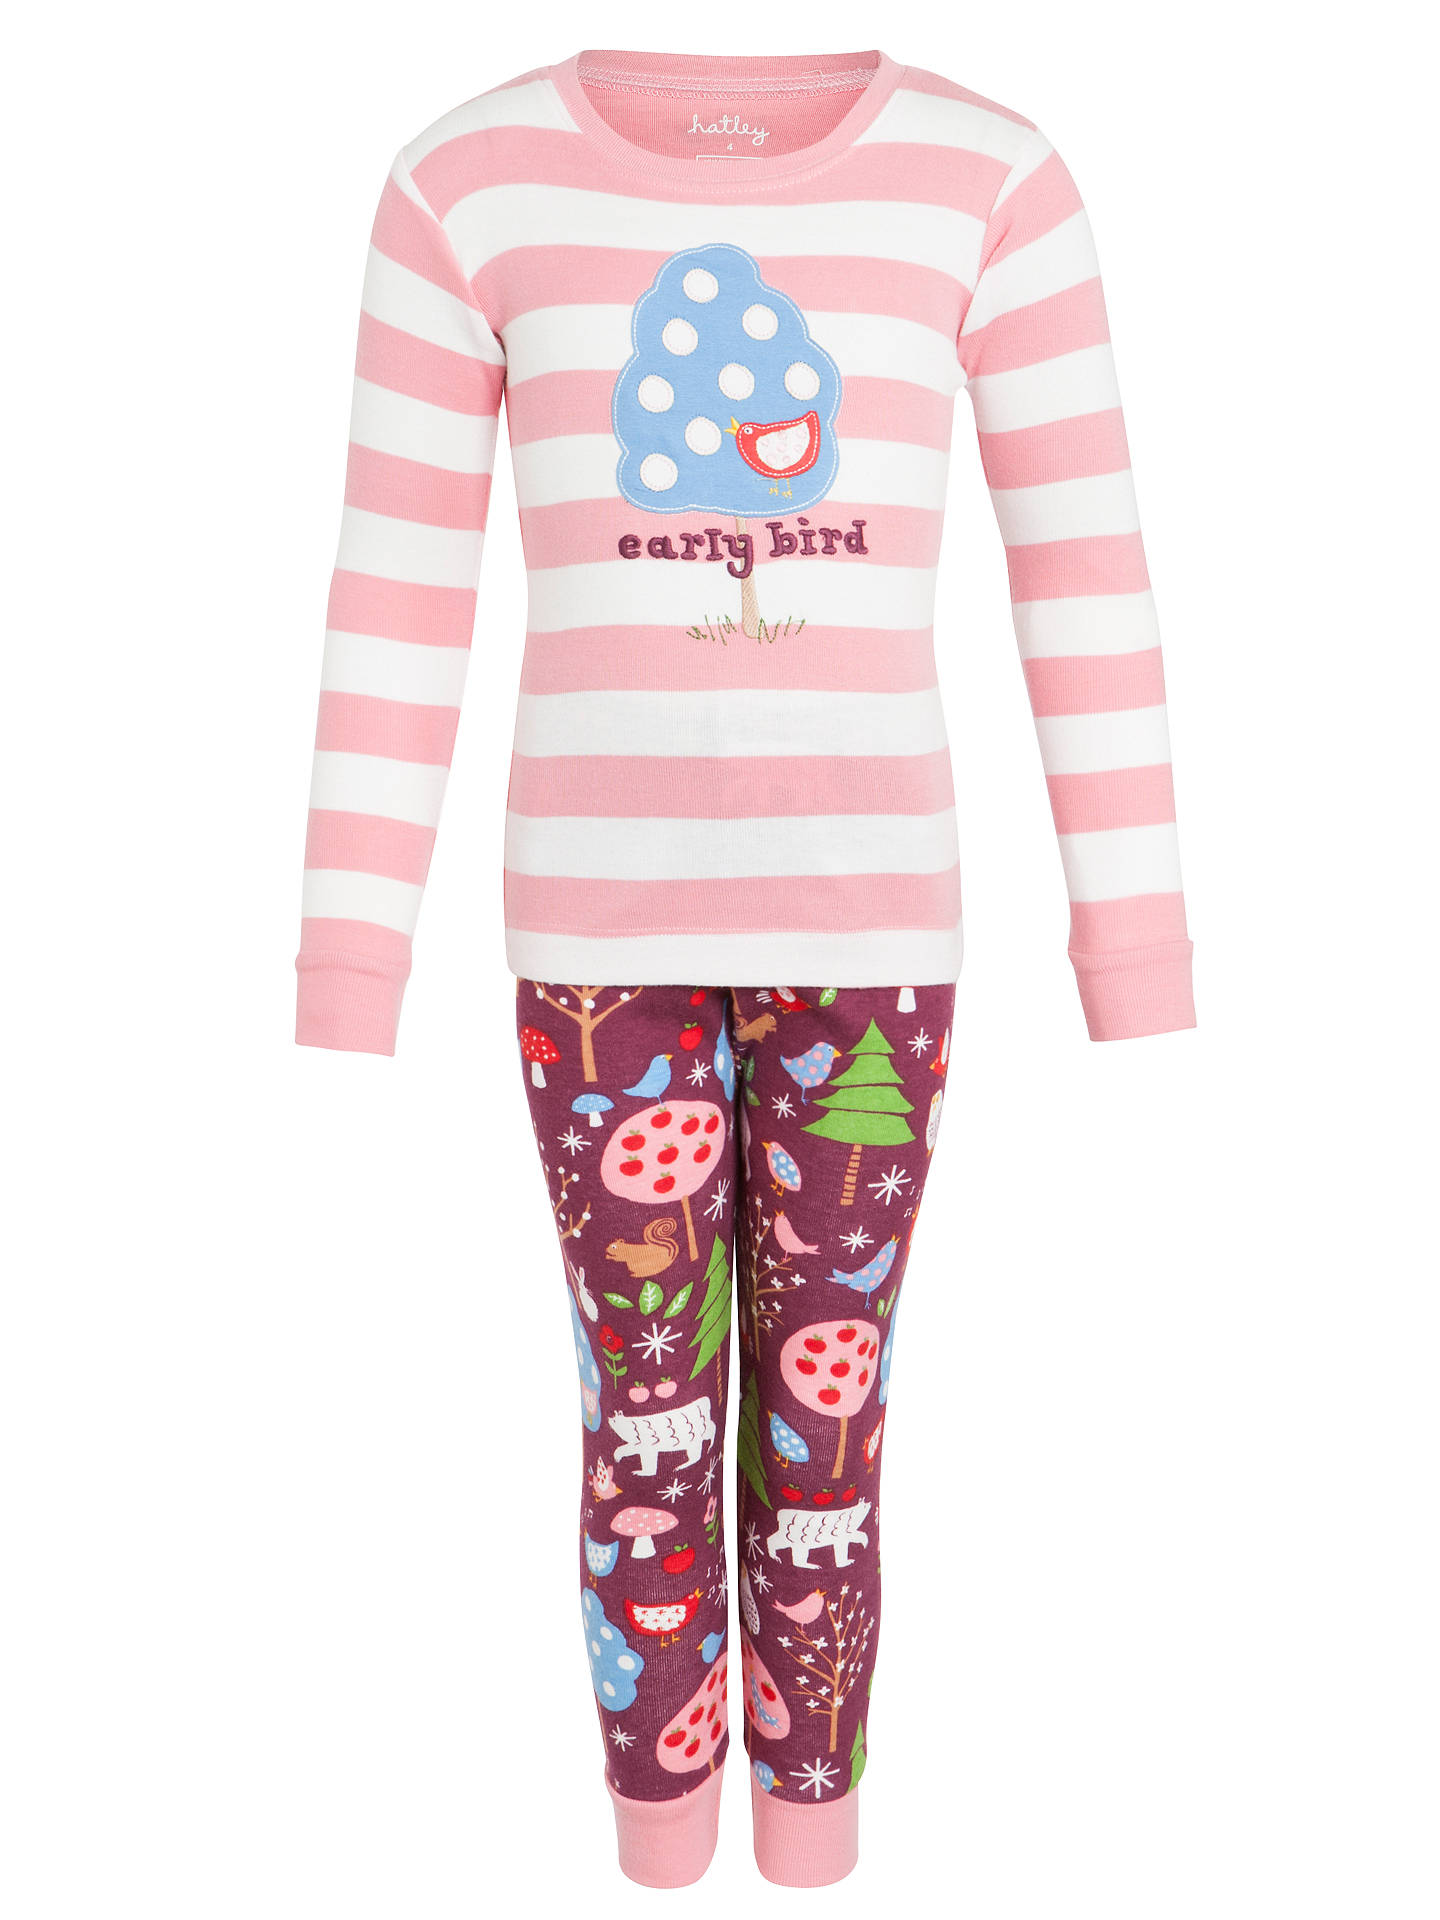 d3a4ef3676 BuyHatley Girls  Stripe Bird Pyjamas